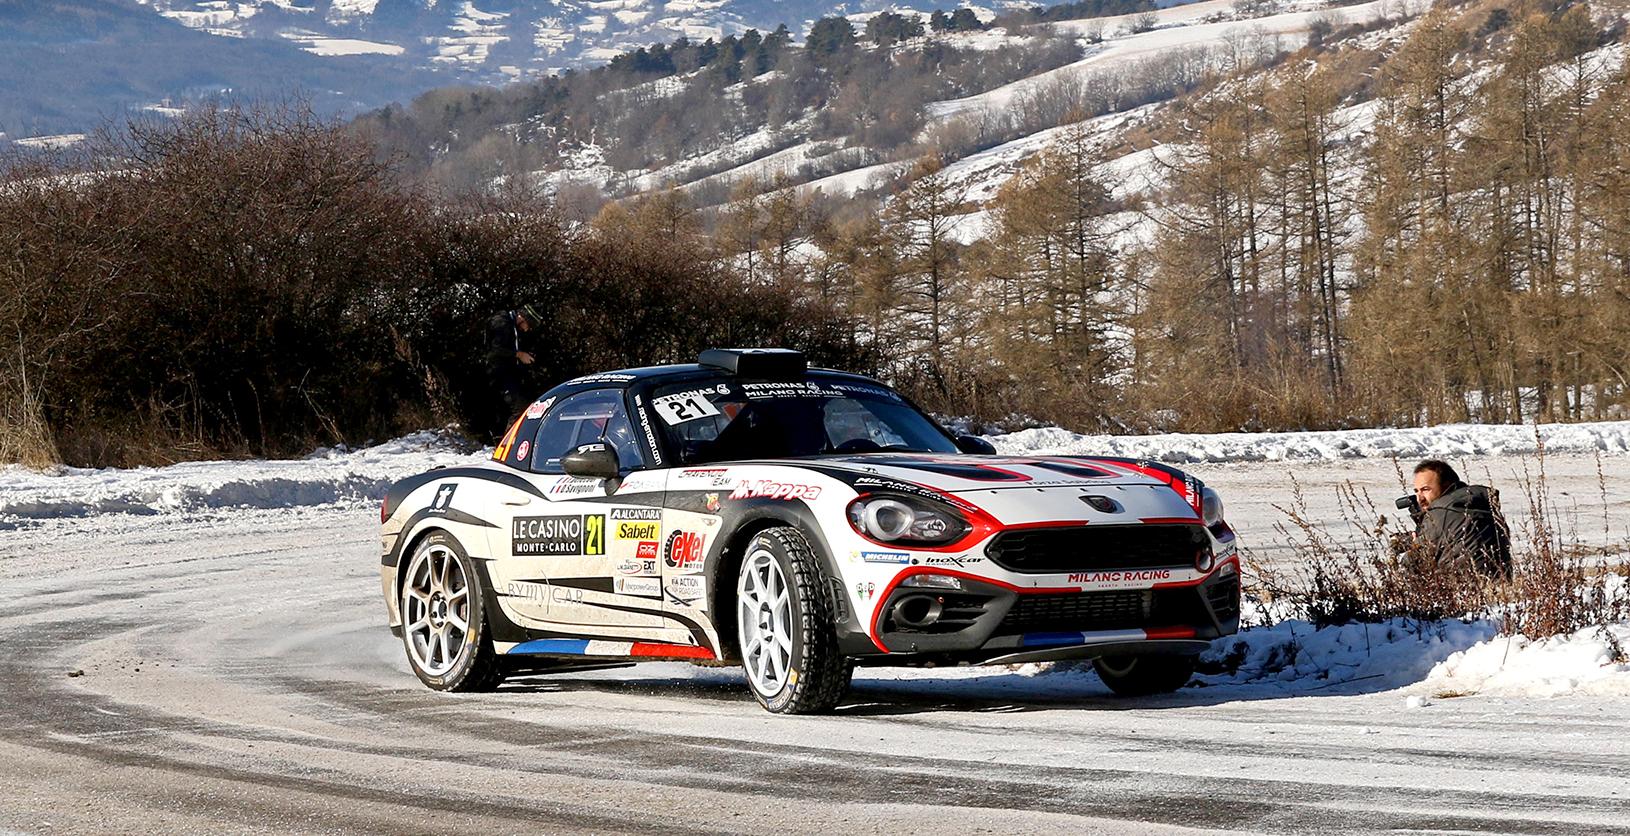 L'Abarth 124 rally sur la neige